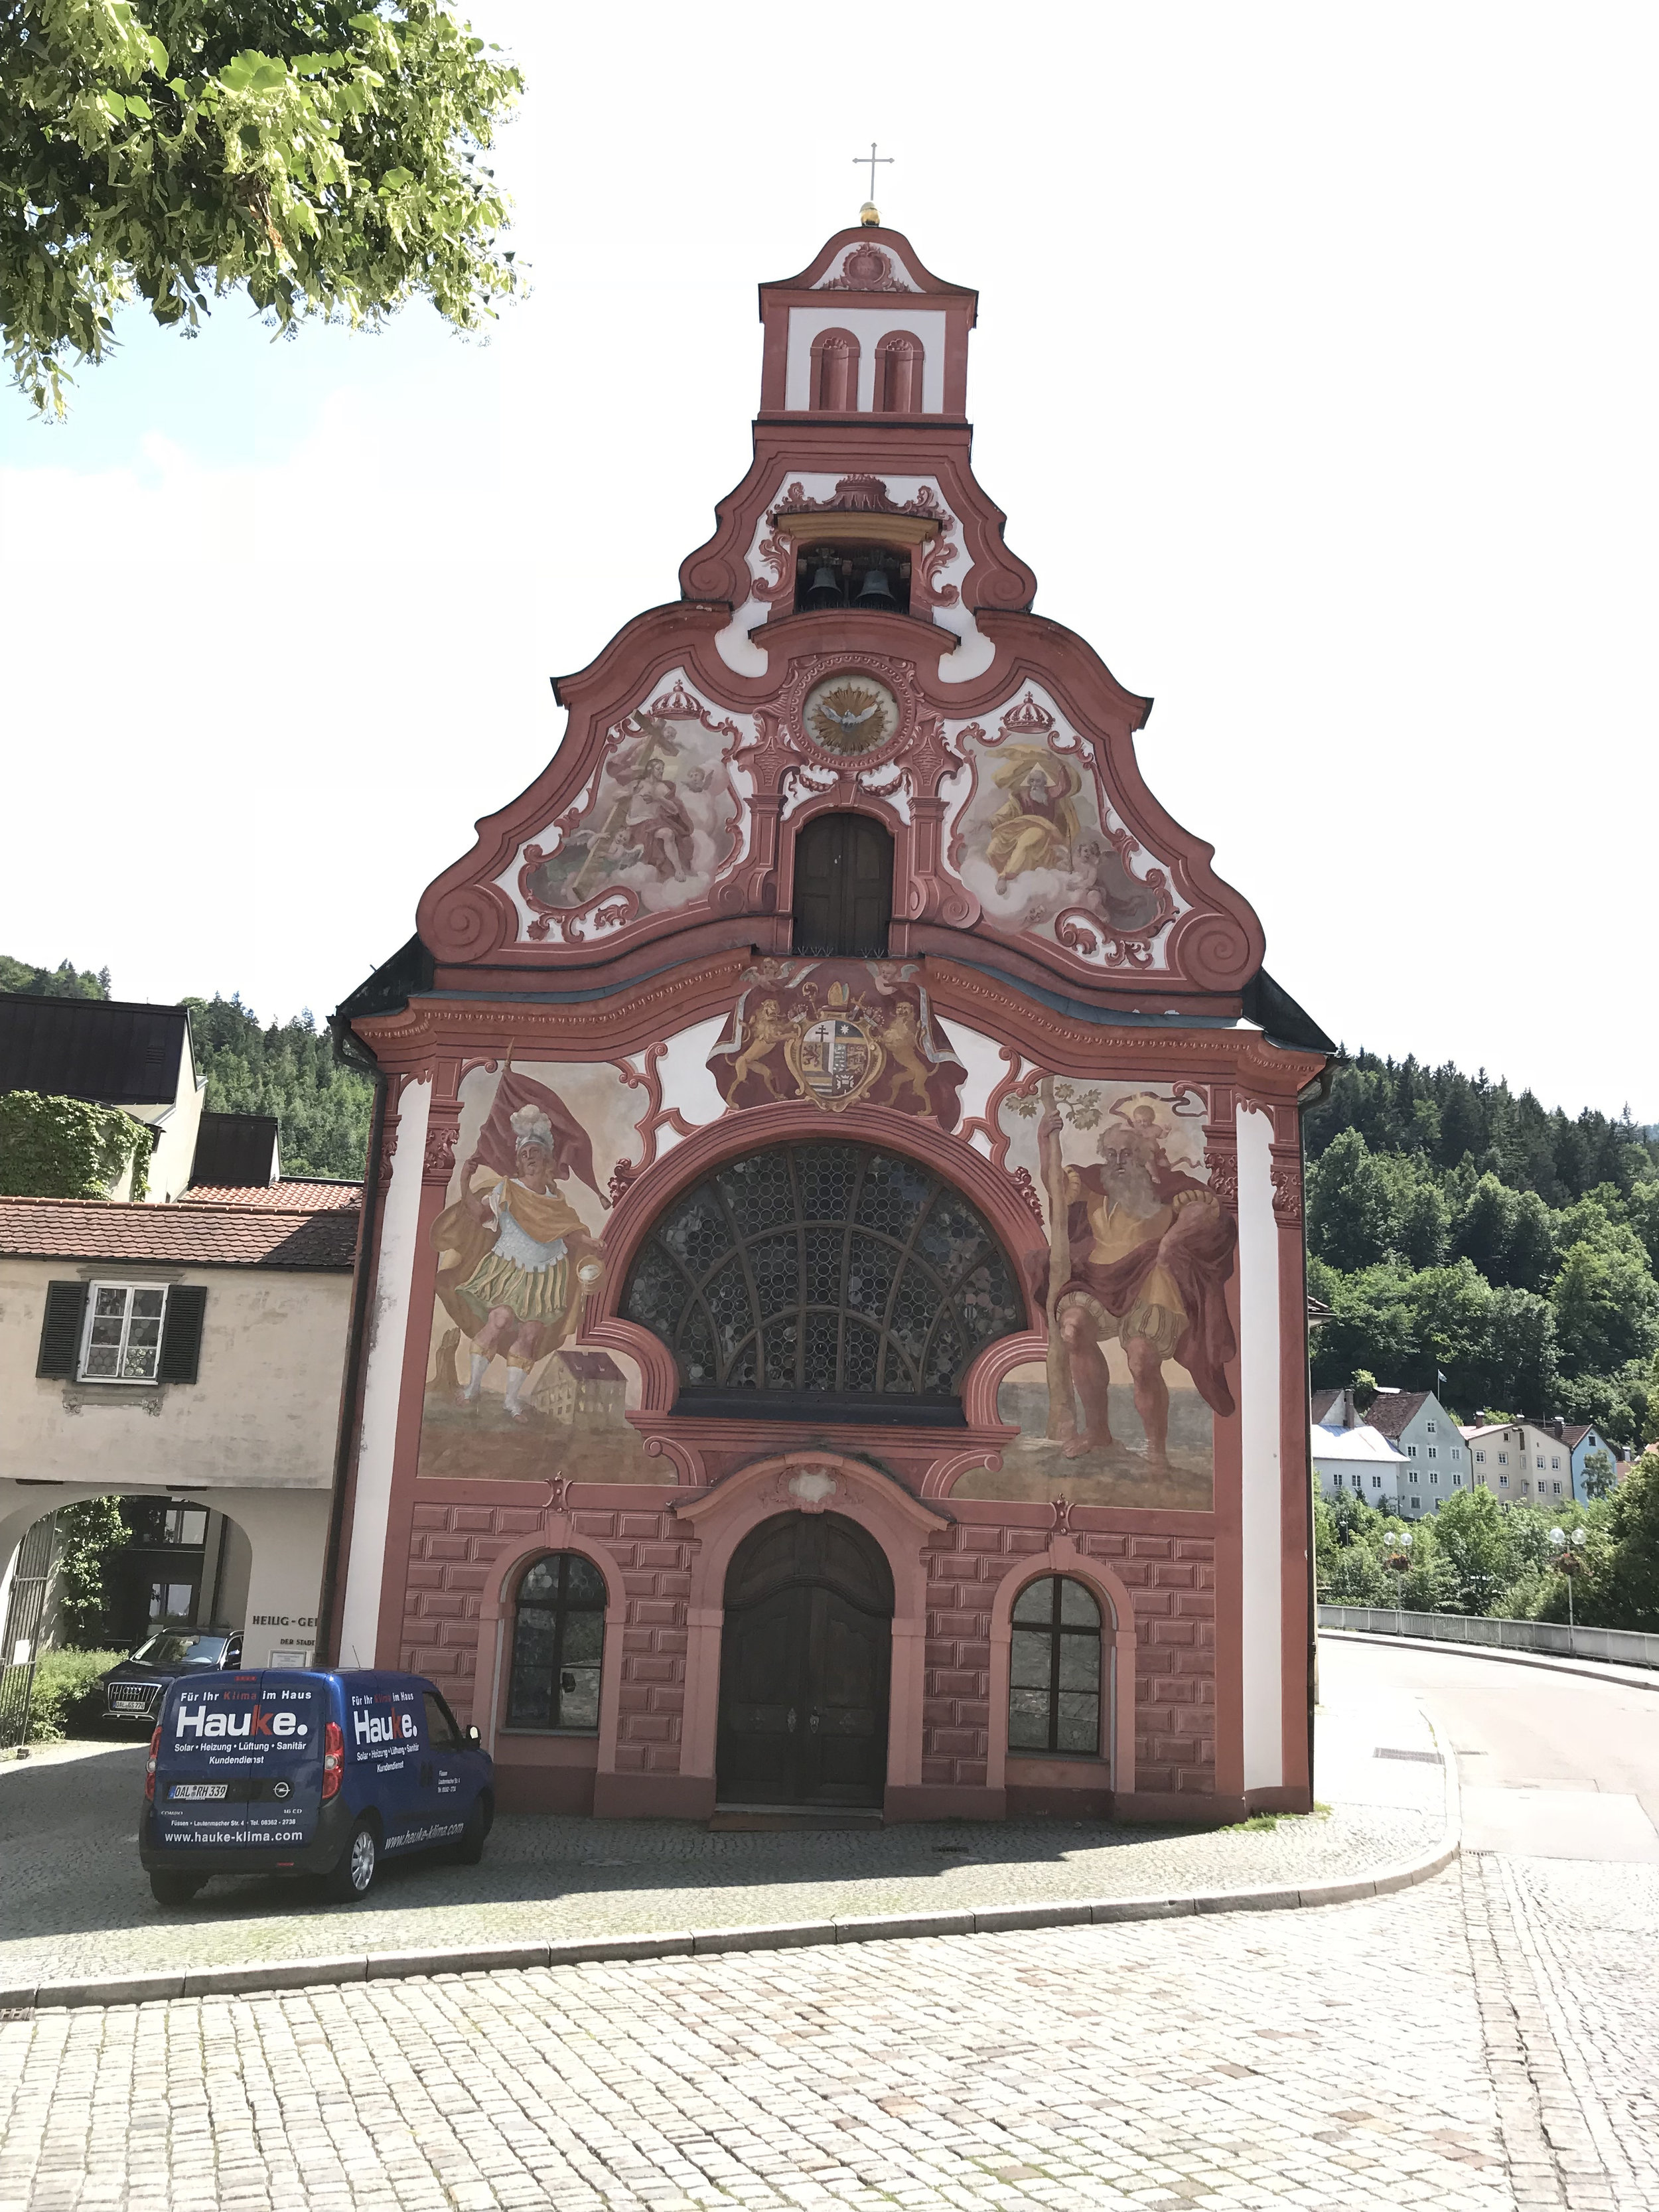 Teri_Day2_Castles_Germany&Austria_spiritedtable_photo29.jpg